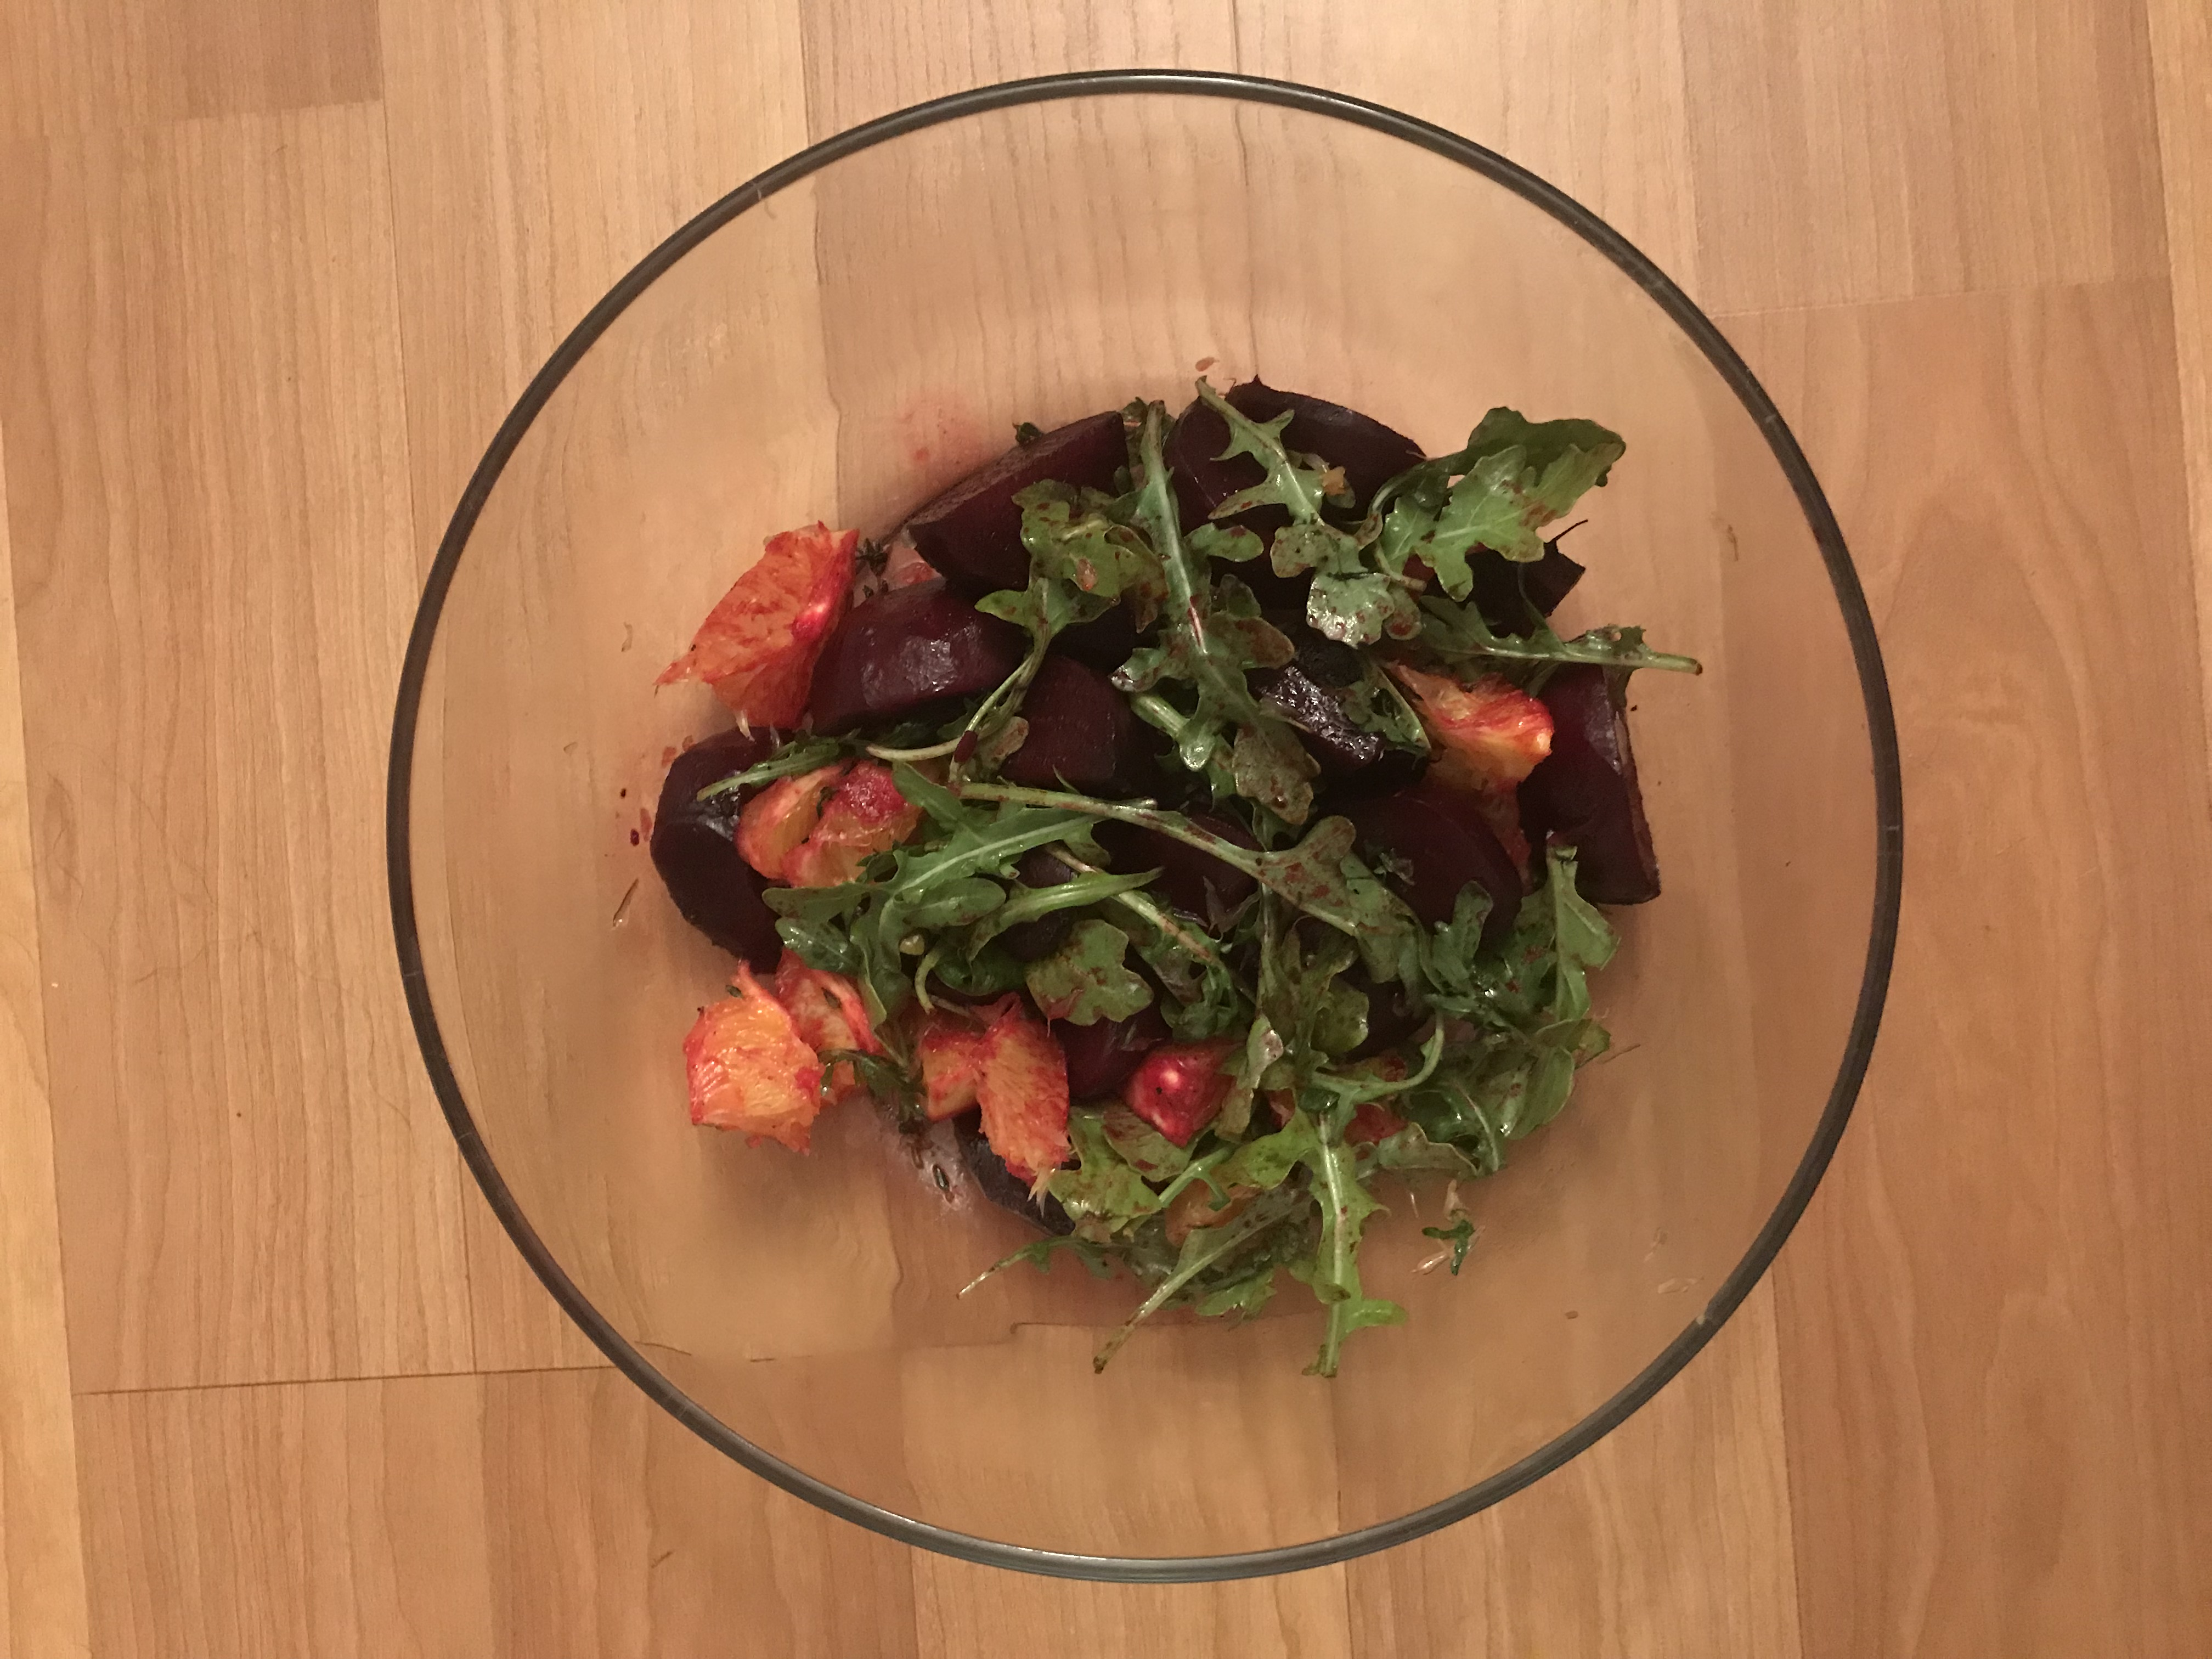 Roasted Beet Salad with Oranges